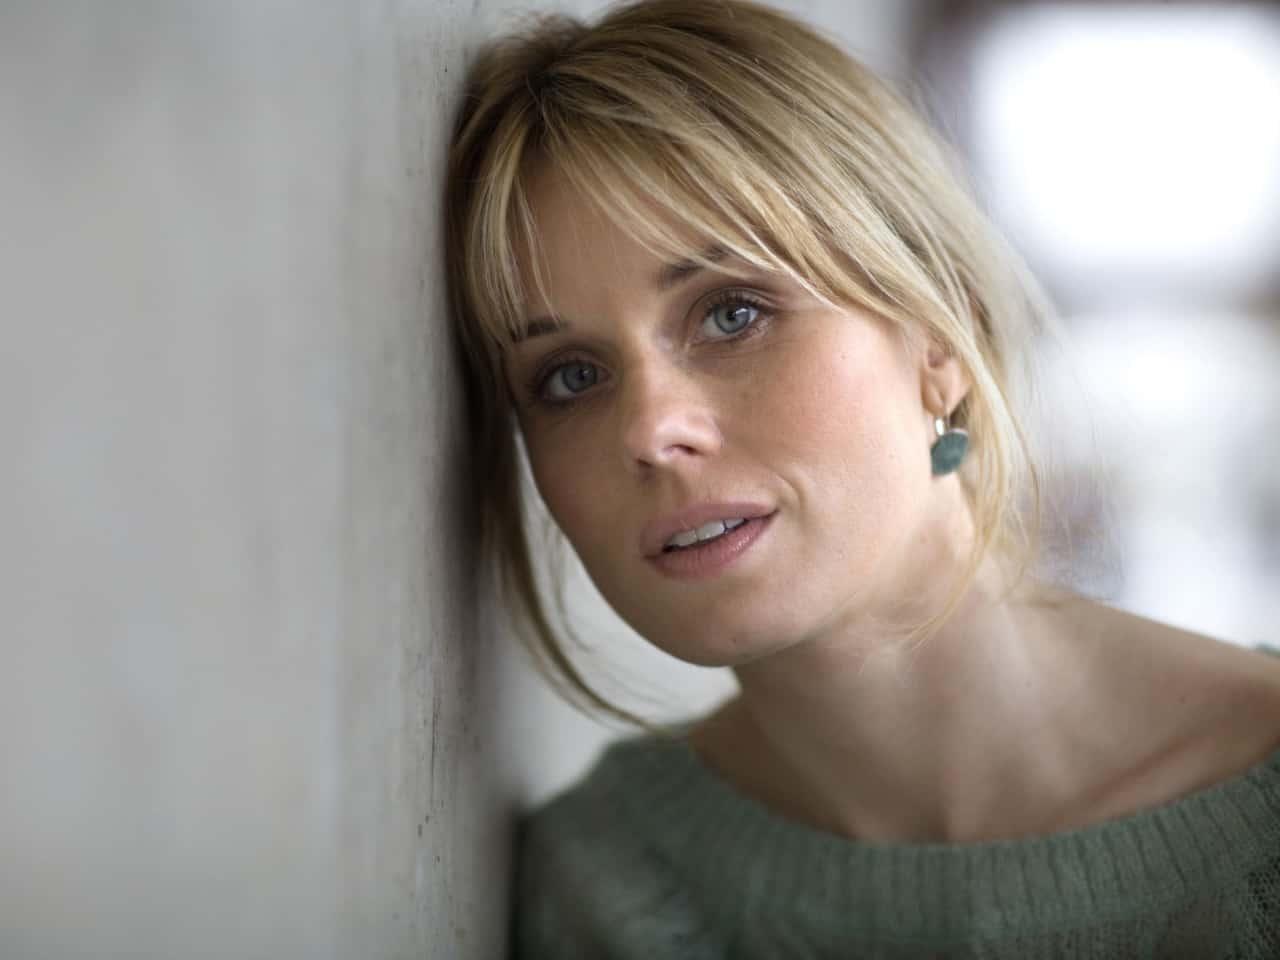 Helena af Sandeberg, Mitt liv, Min historia - Ellos - YouTube